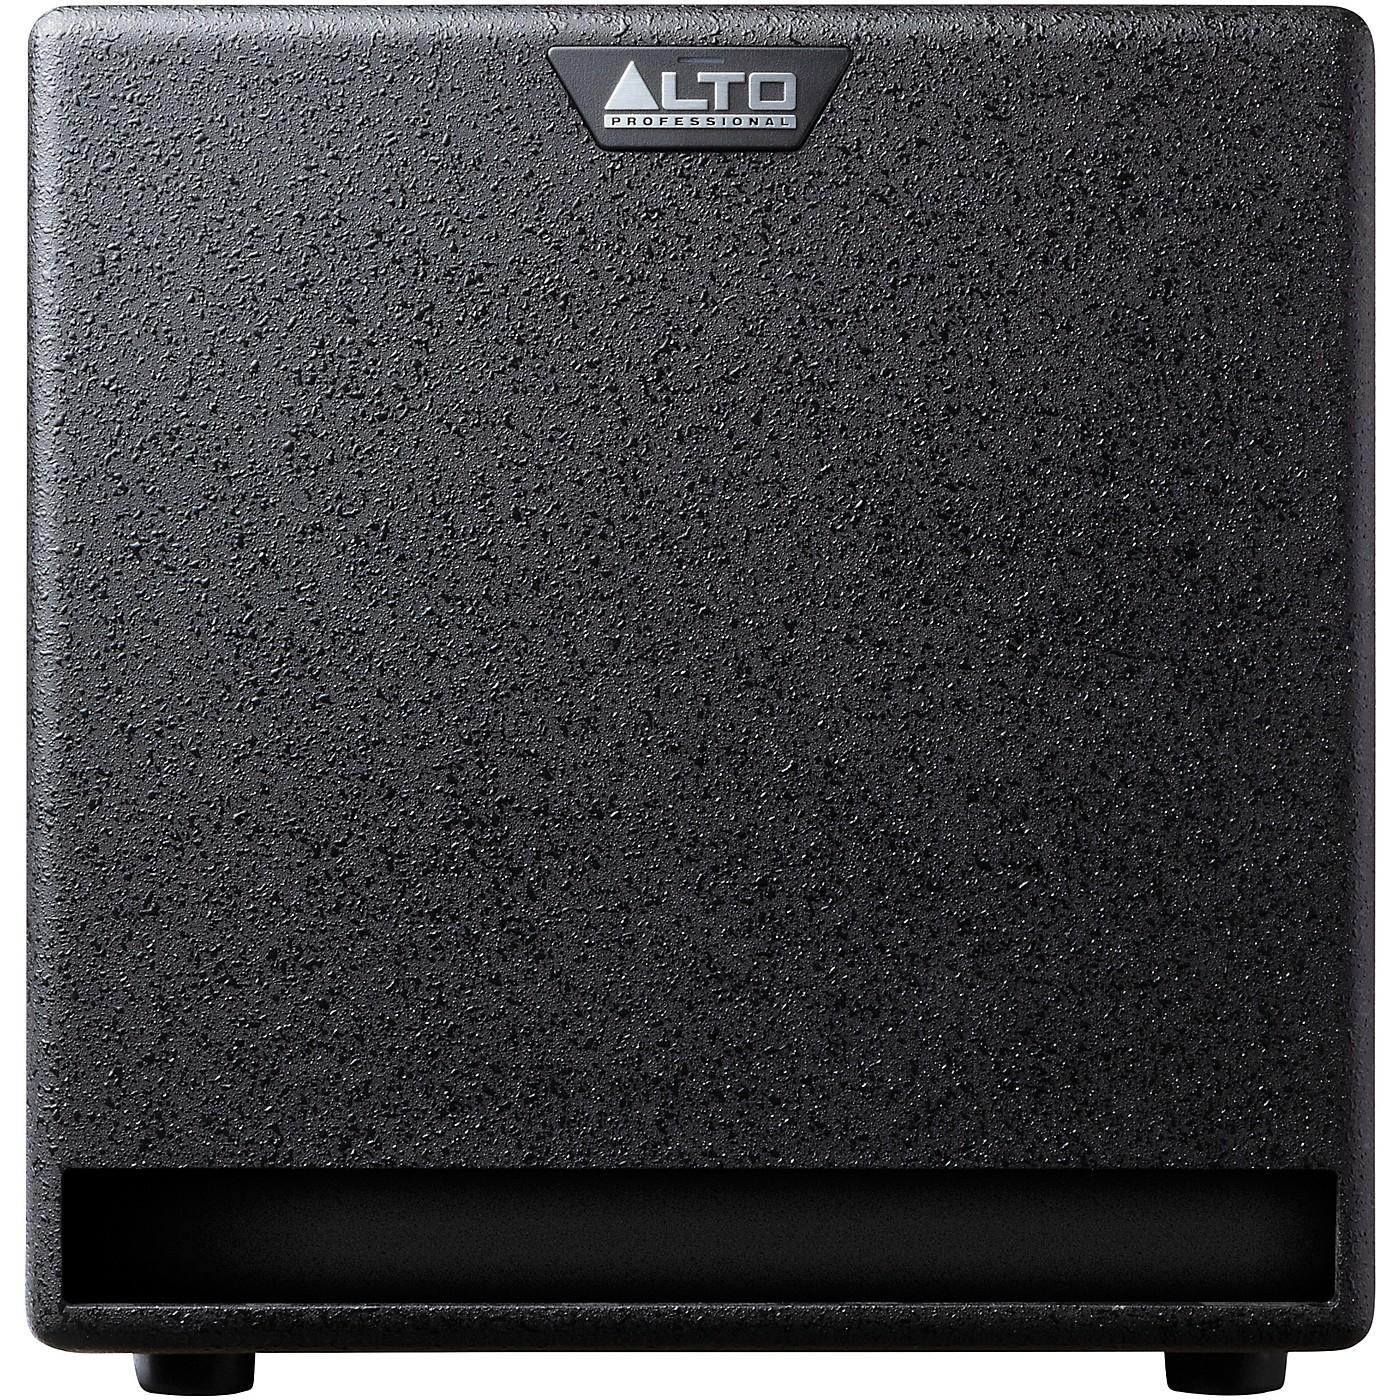 Alto TX212S 900W 12